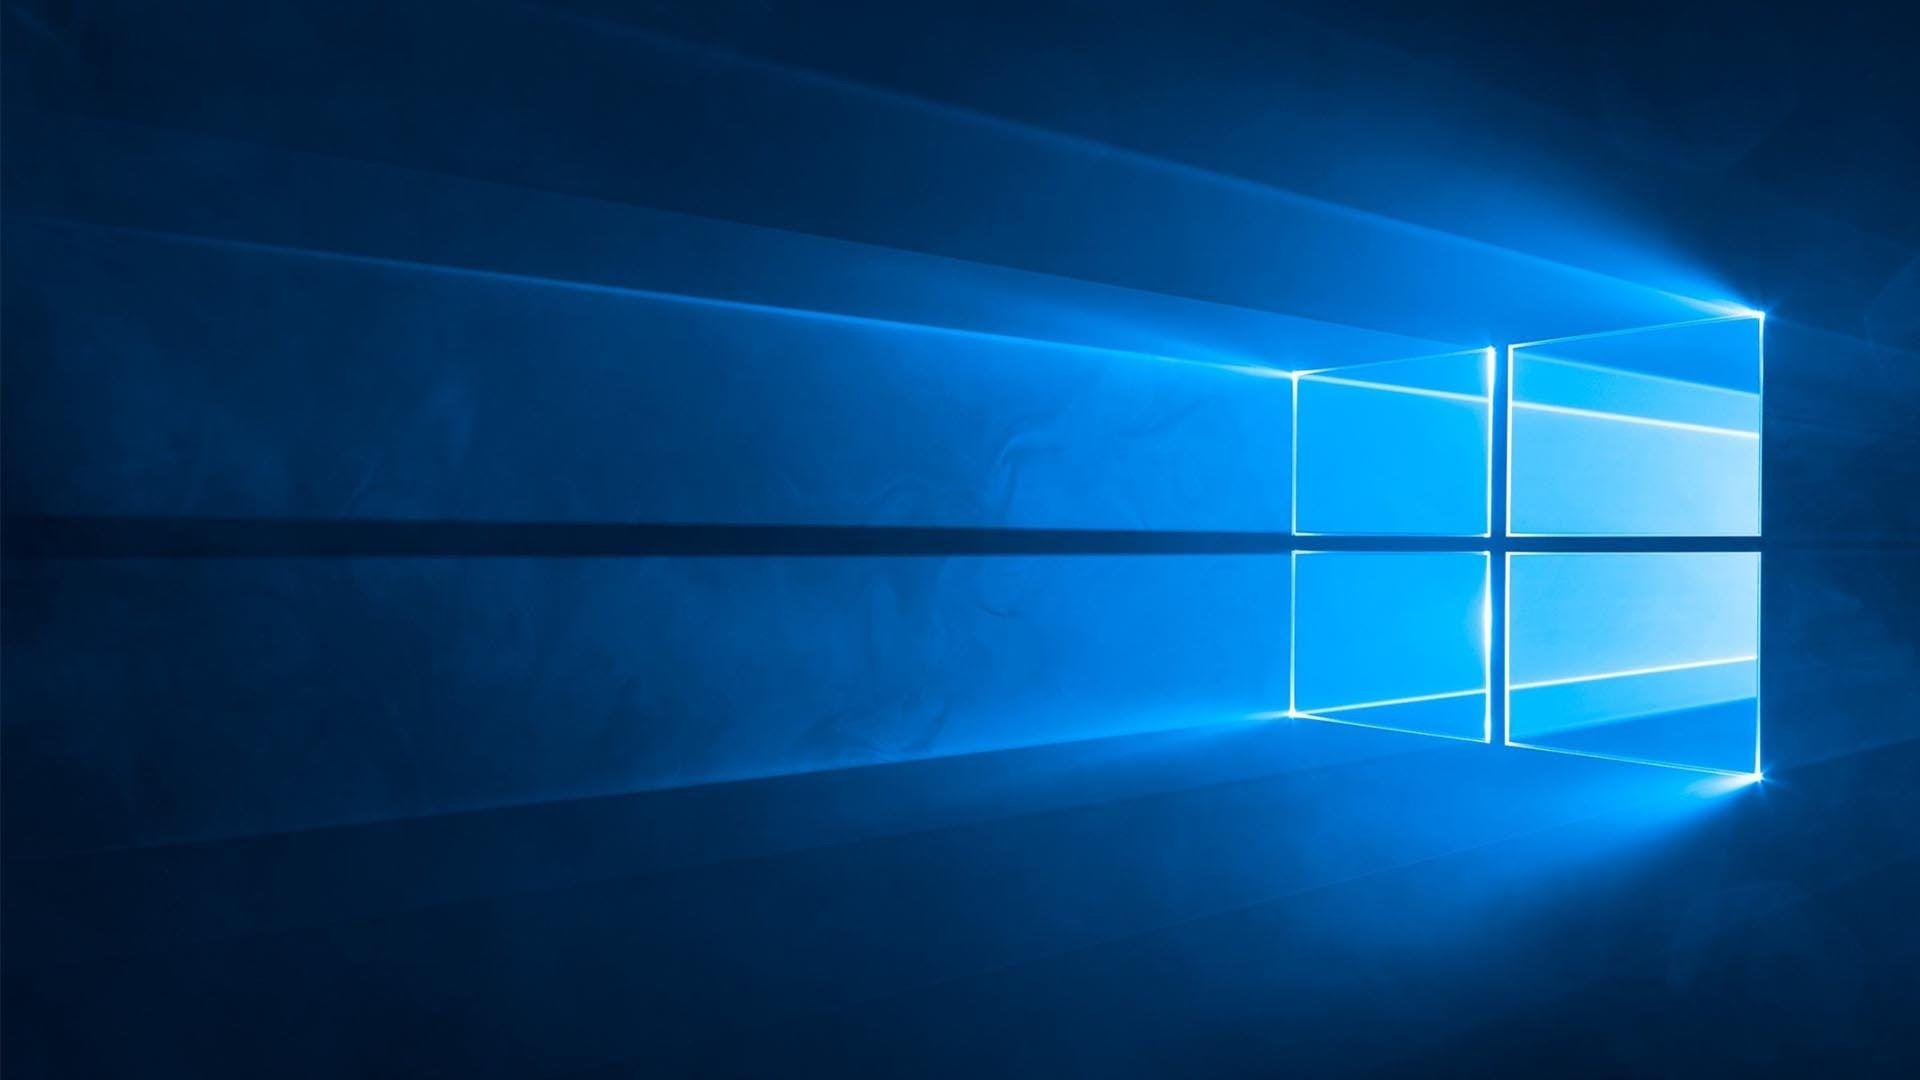 How To Change The Windows 10 Login Screen Wallpaper Youtube Windows 10 Windows Screen Wallpaper